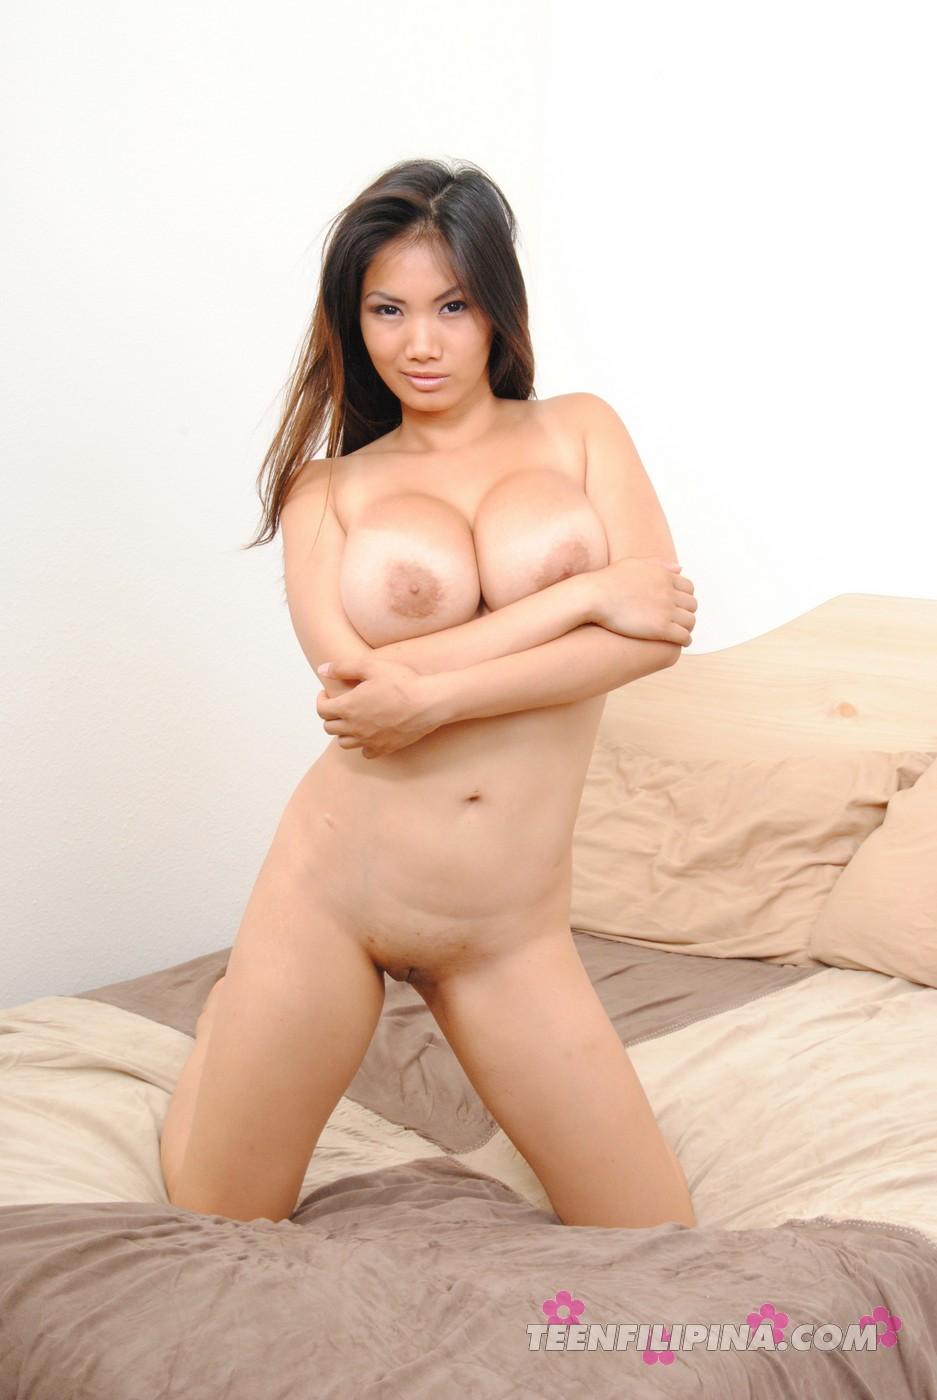 gorgeous naked women model